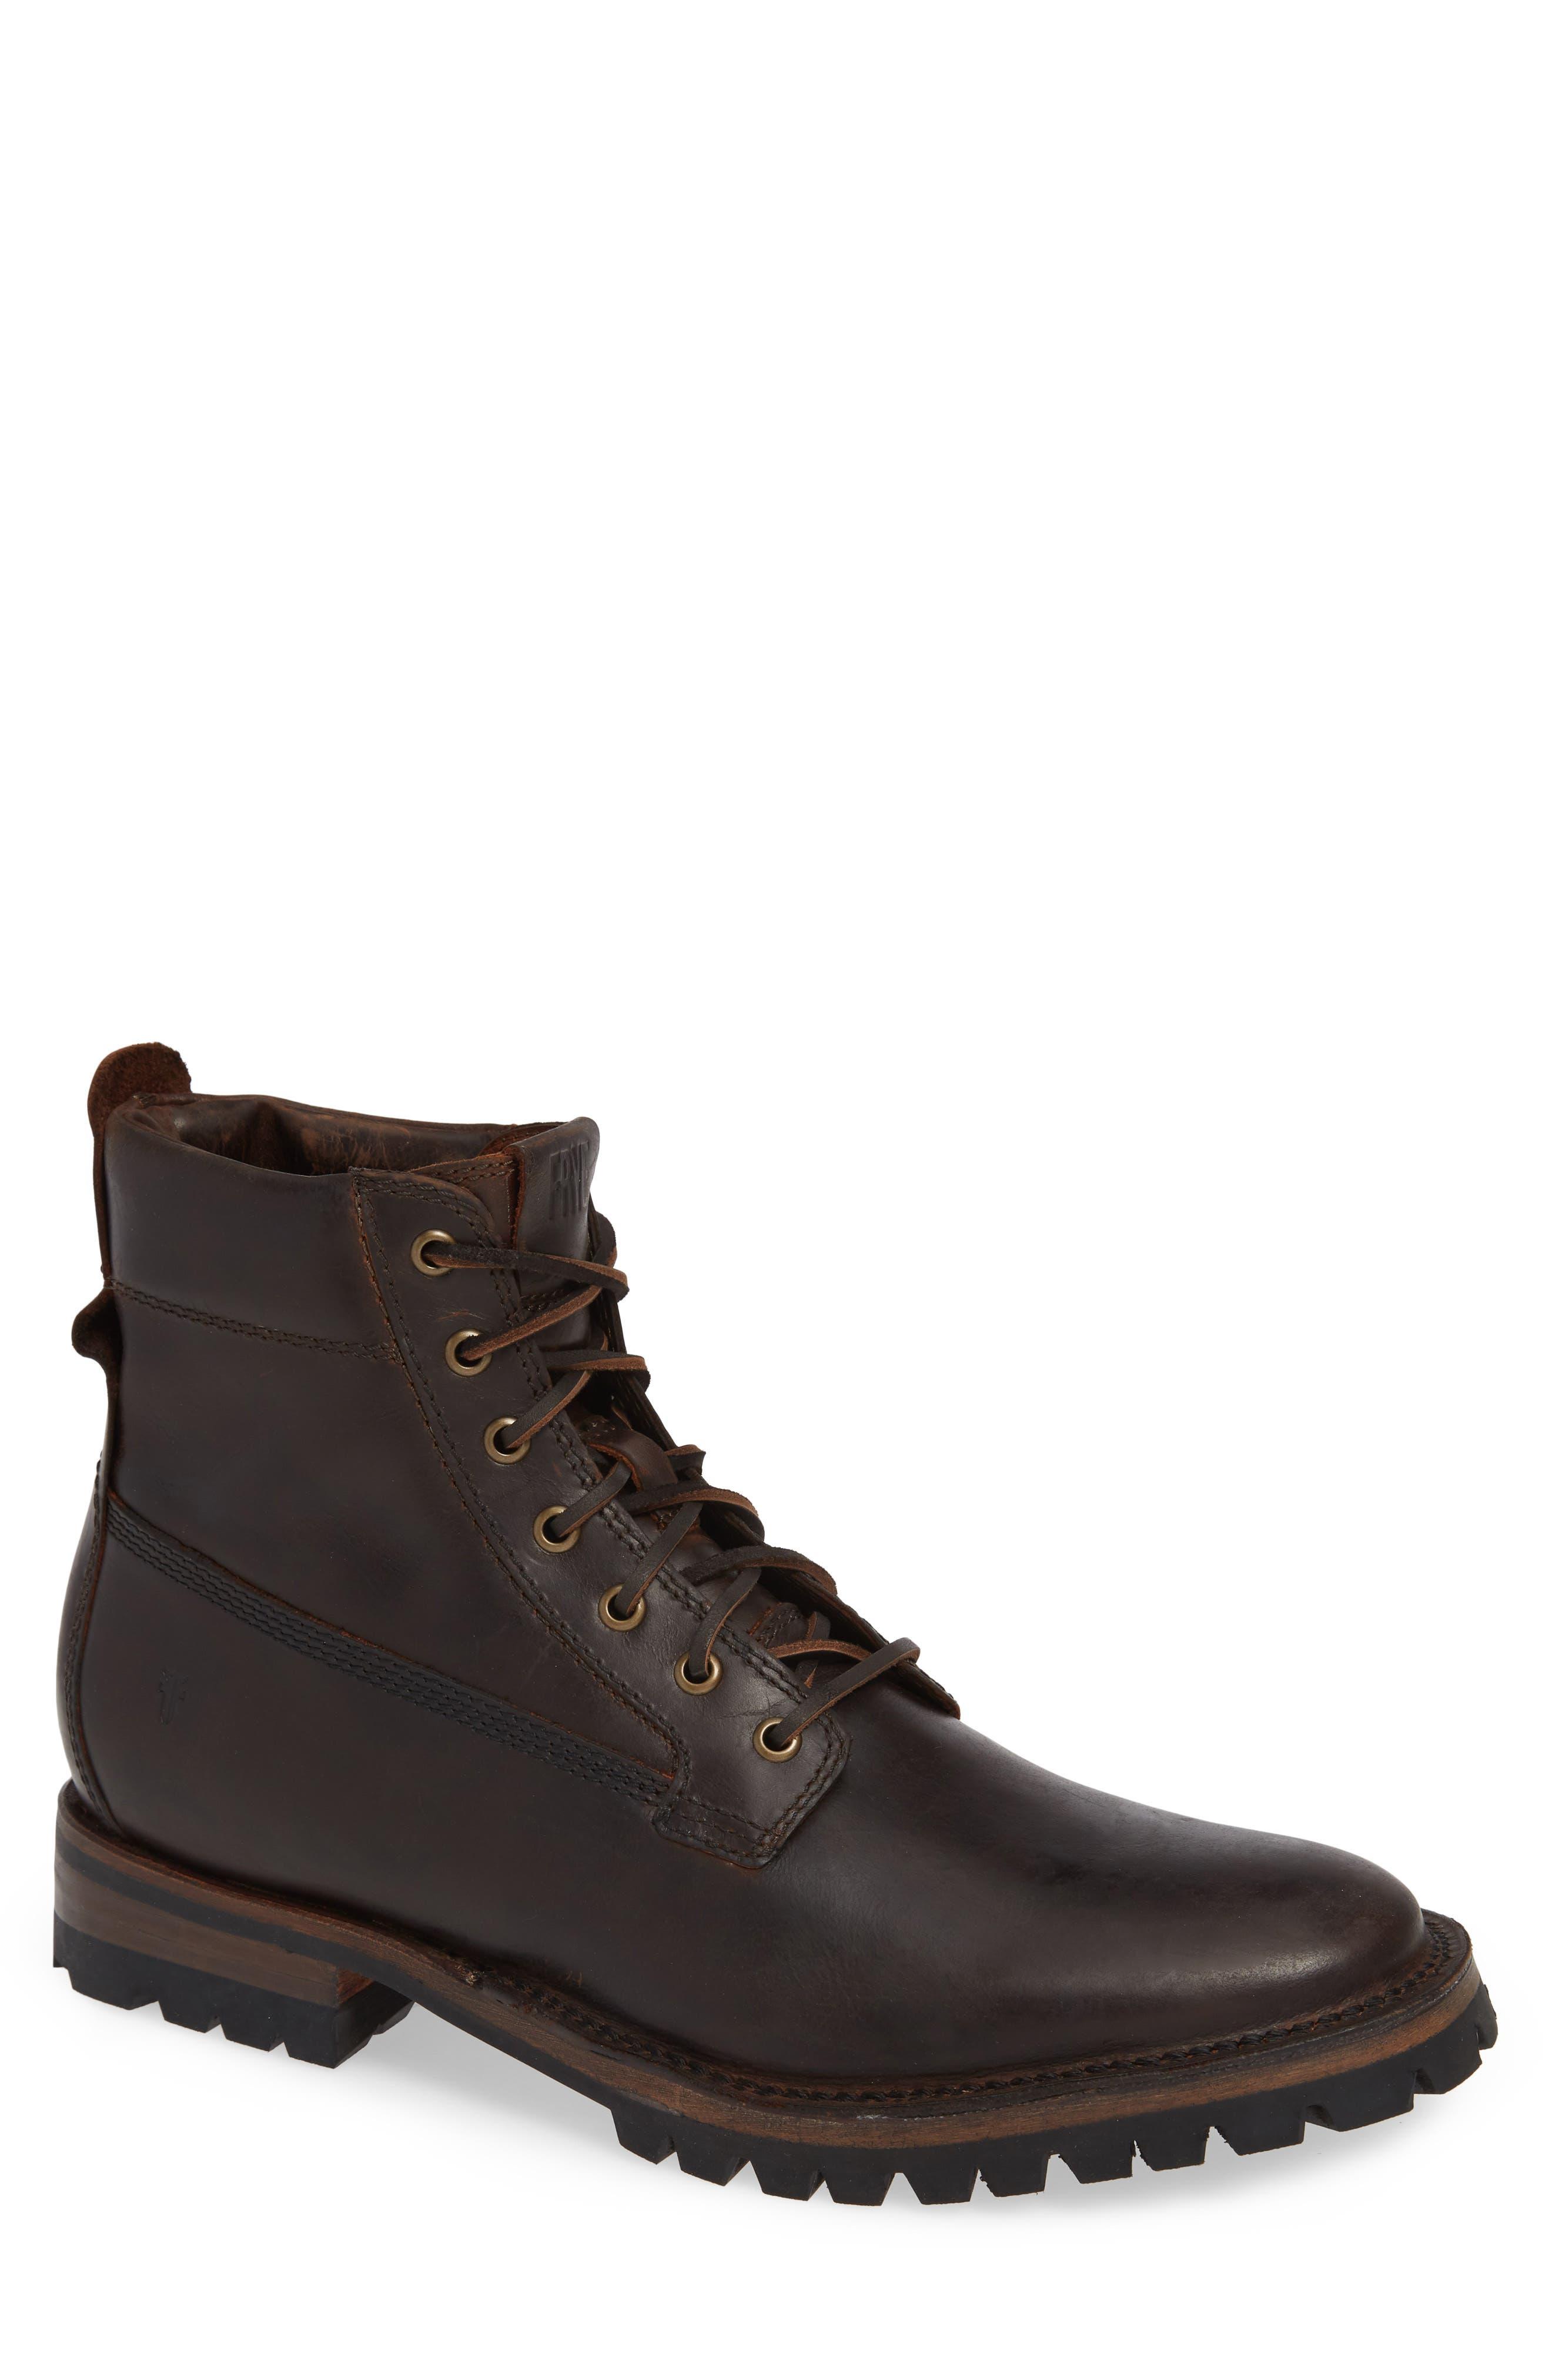 Union Plain Toe Boot,                             Main thumbnail 1, color,                             DARK BROWN